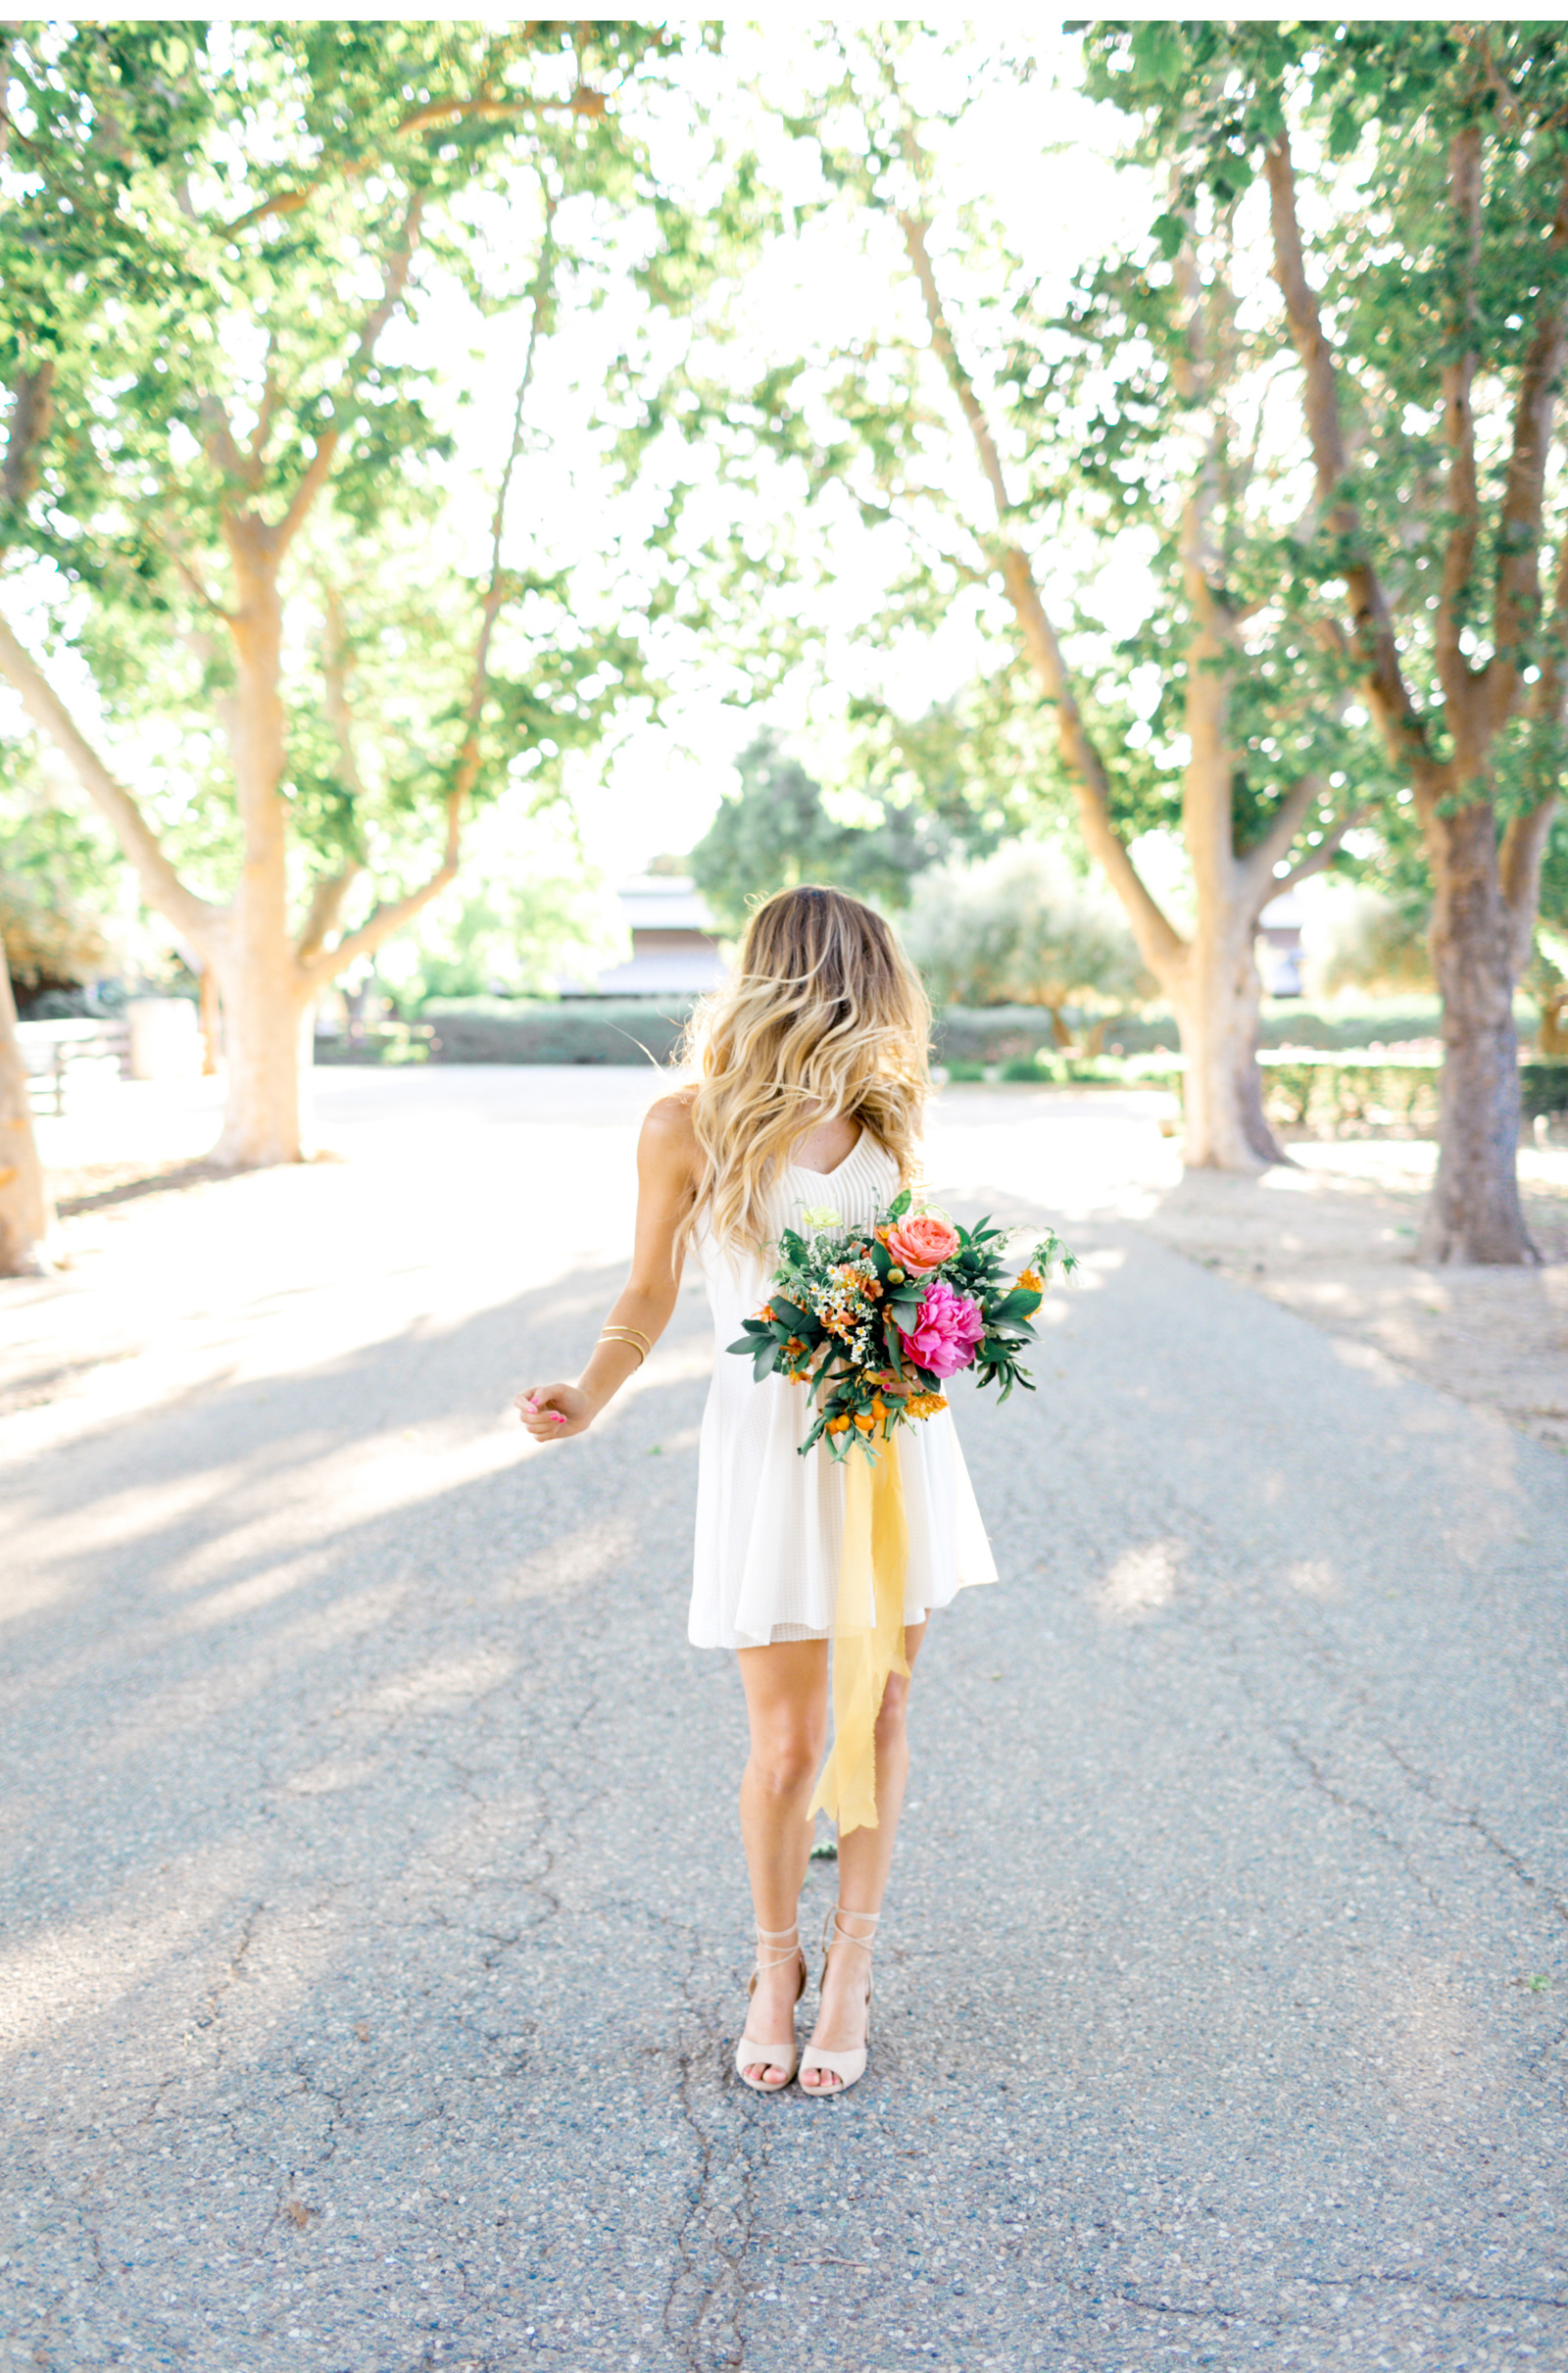 San-Luis-Obispo-Wedding-Photographer-Hammersky-Vineyard-Natalie-Schutt-Photography_02.jpg